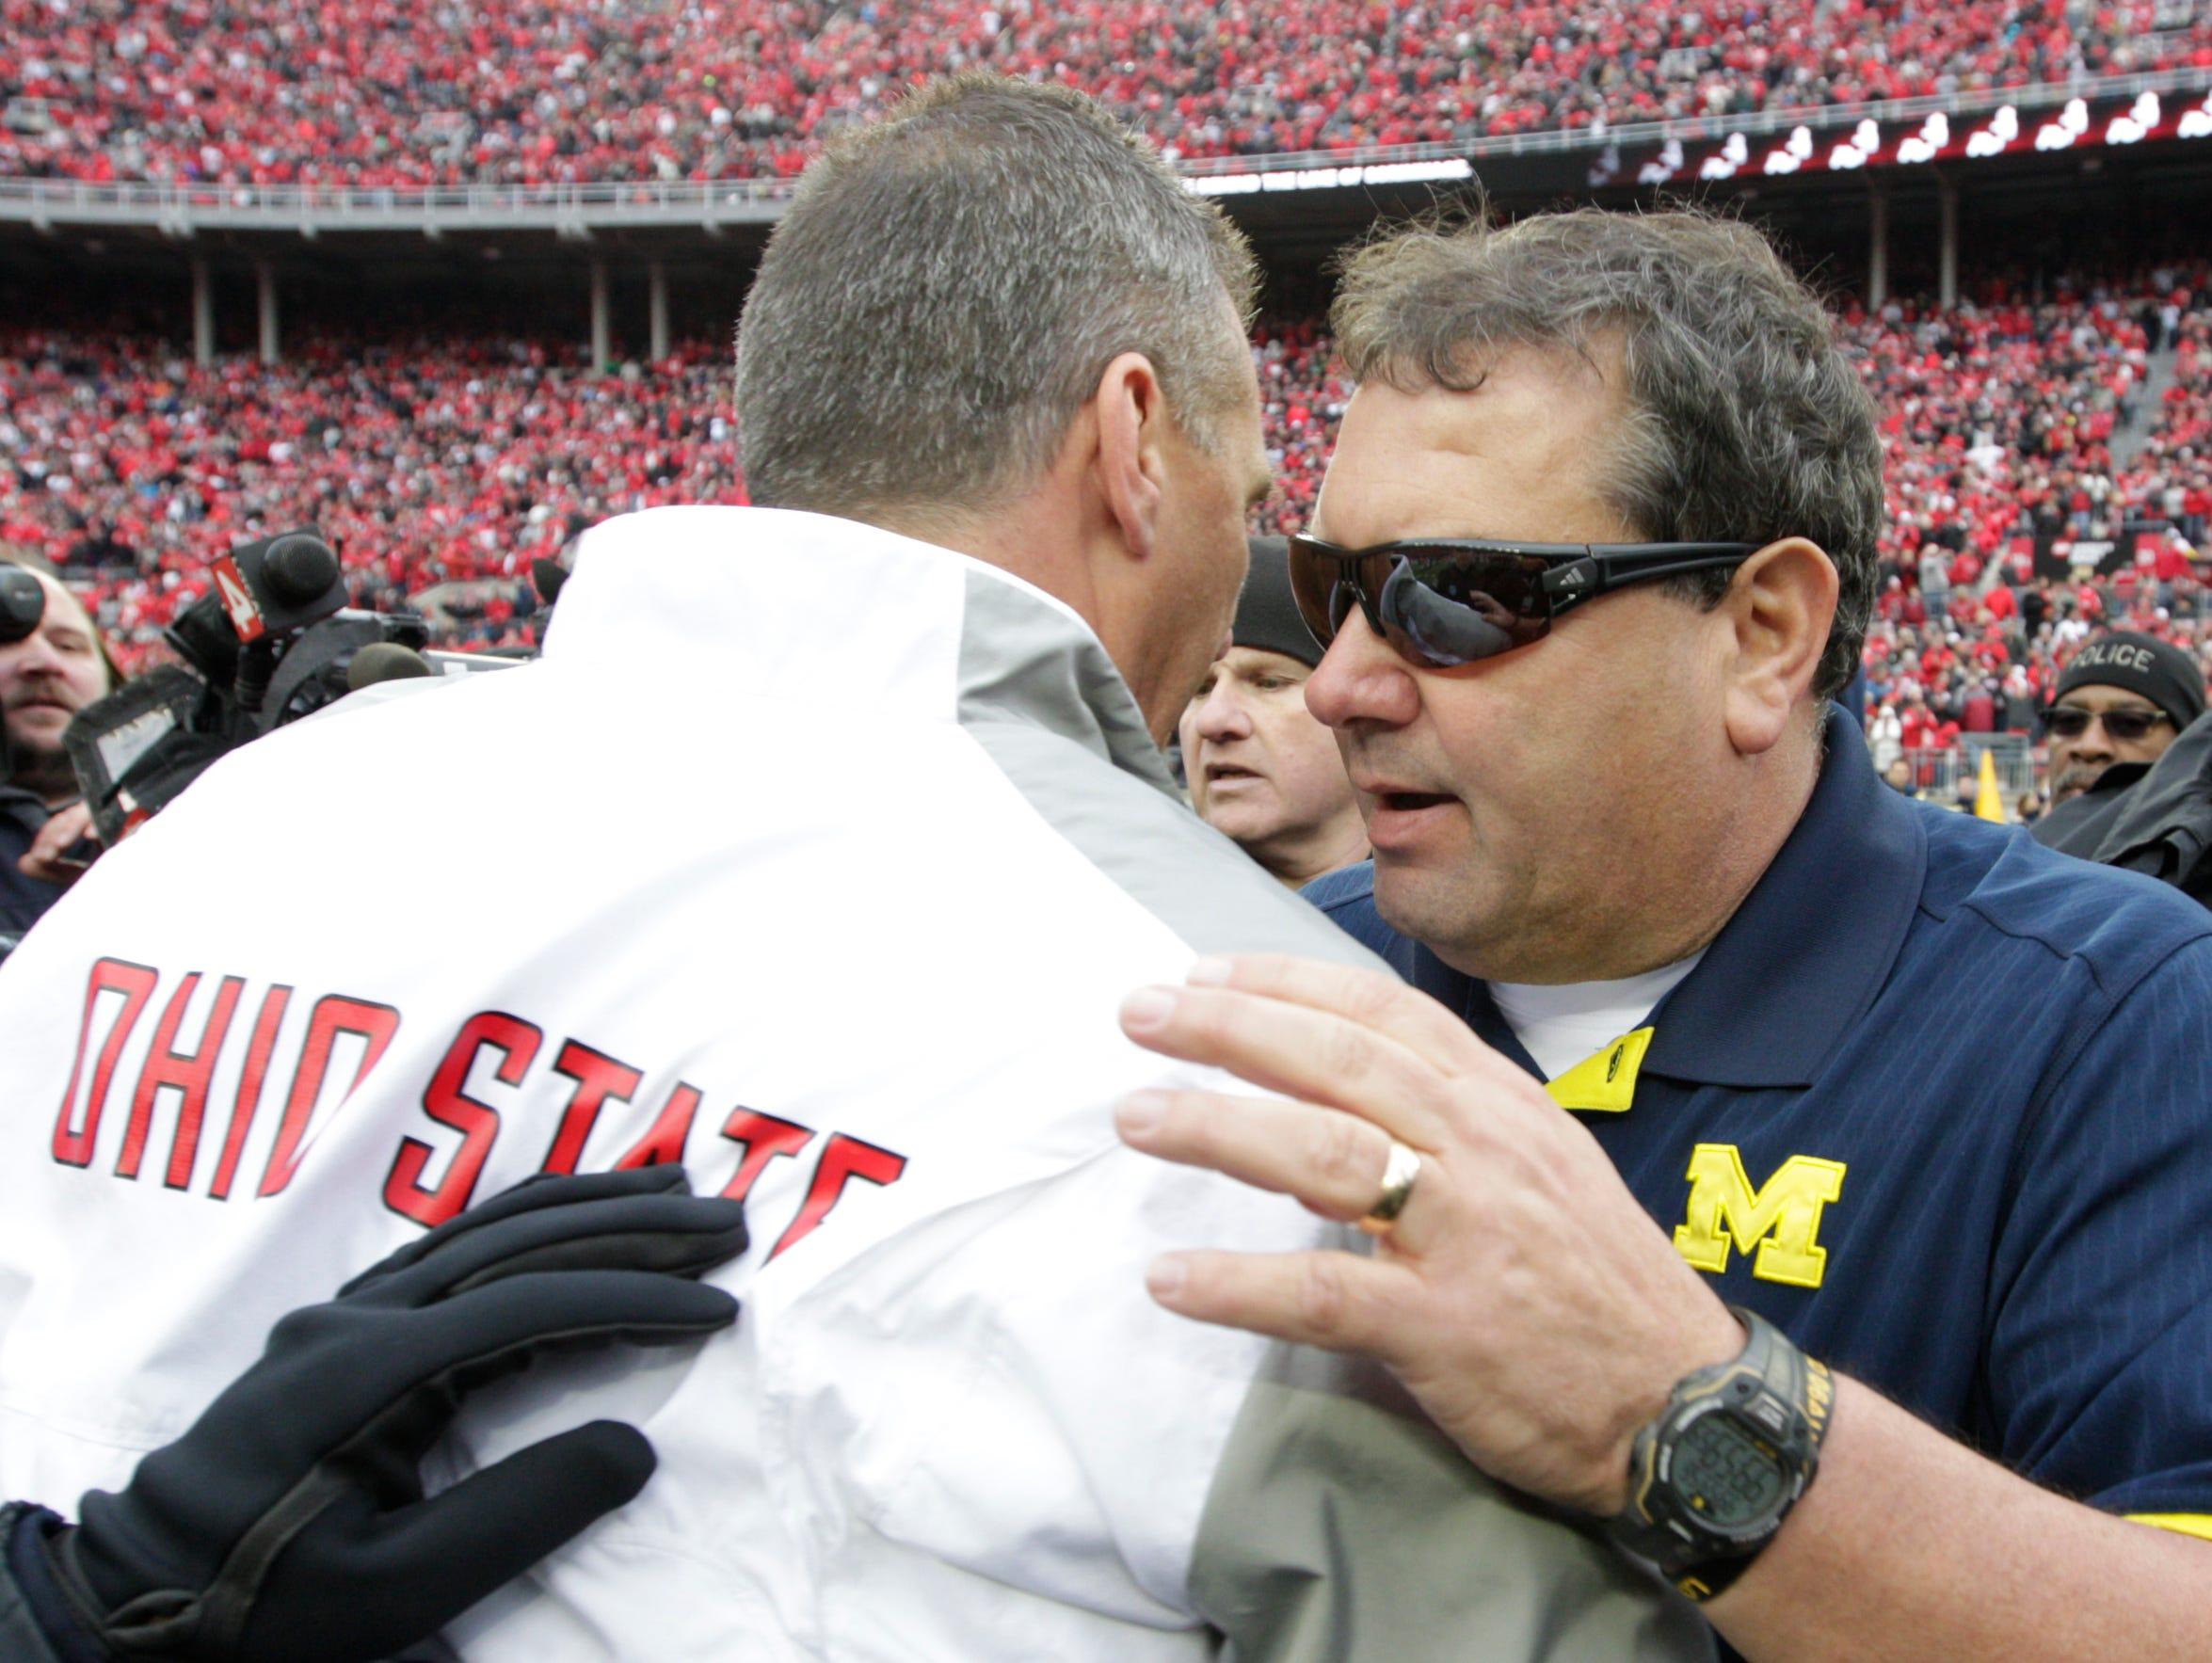 Brady Hoke, right, shakes hands with Ohio State head